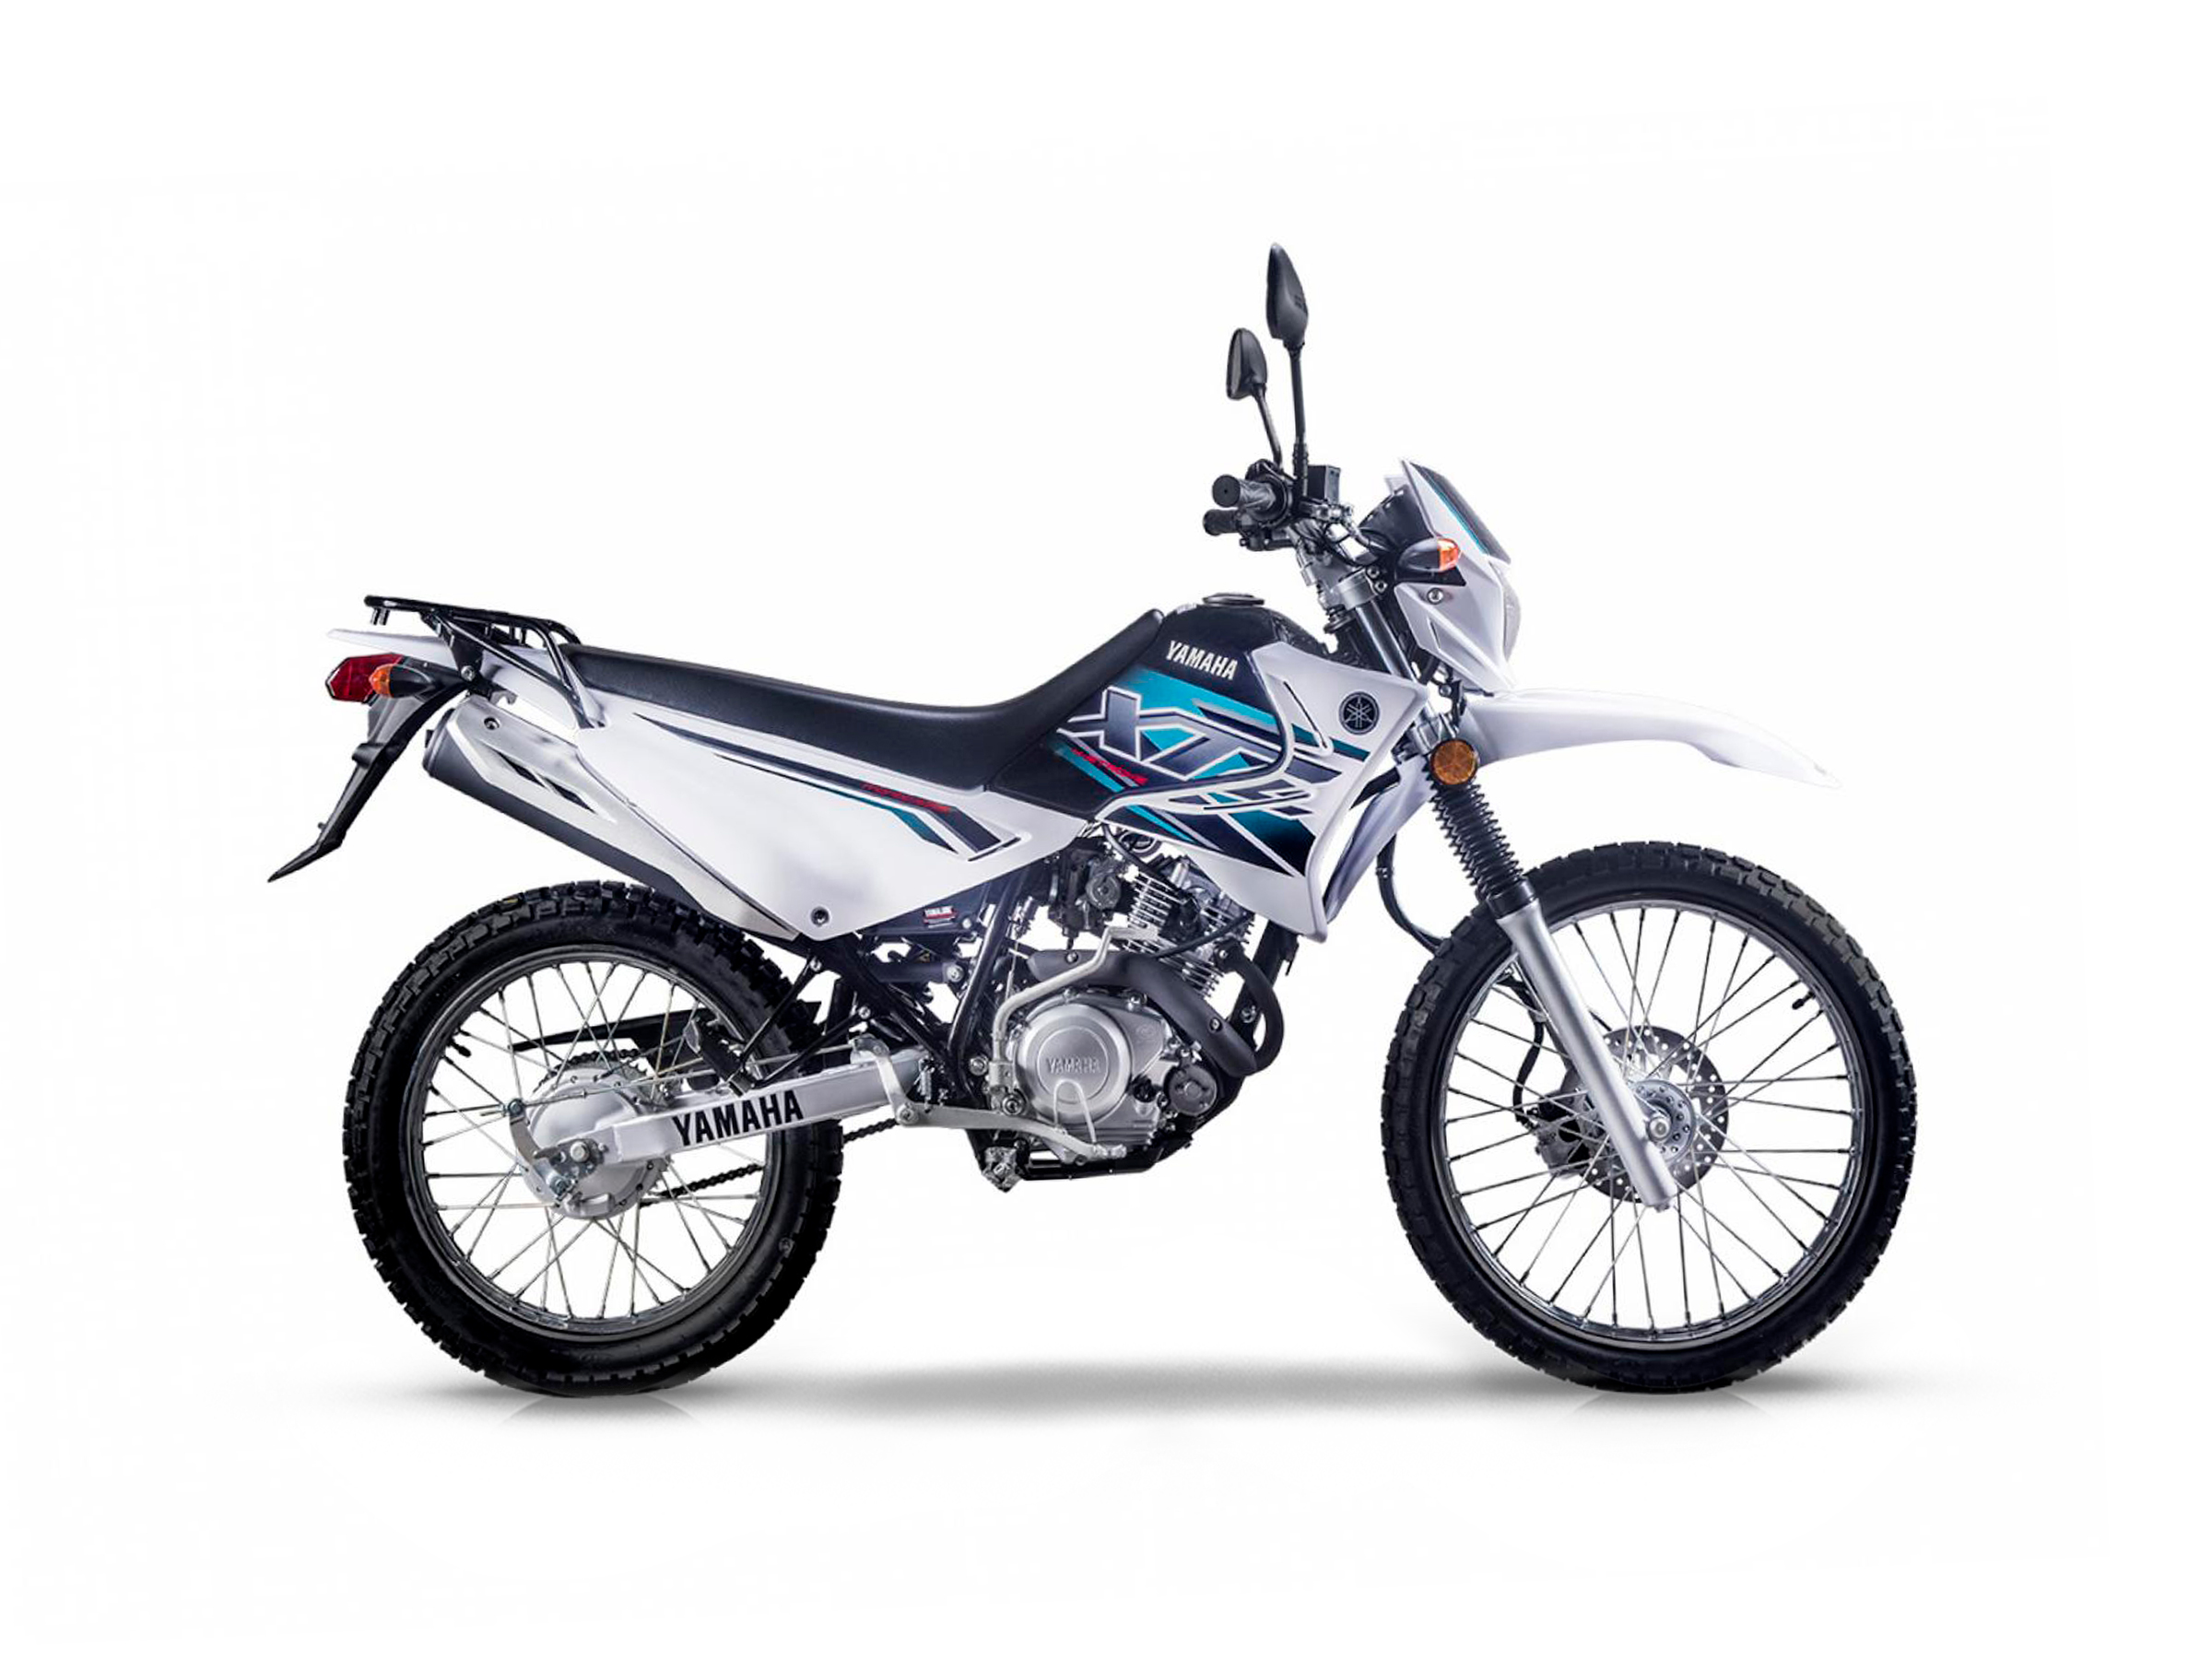 44c627e0a64 XTZ125 - Adventure / On Off | Yamaha Motor Argentina